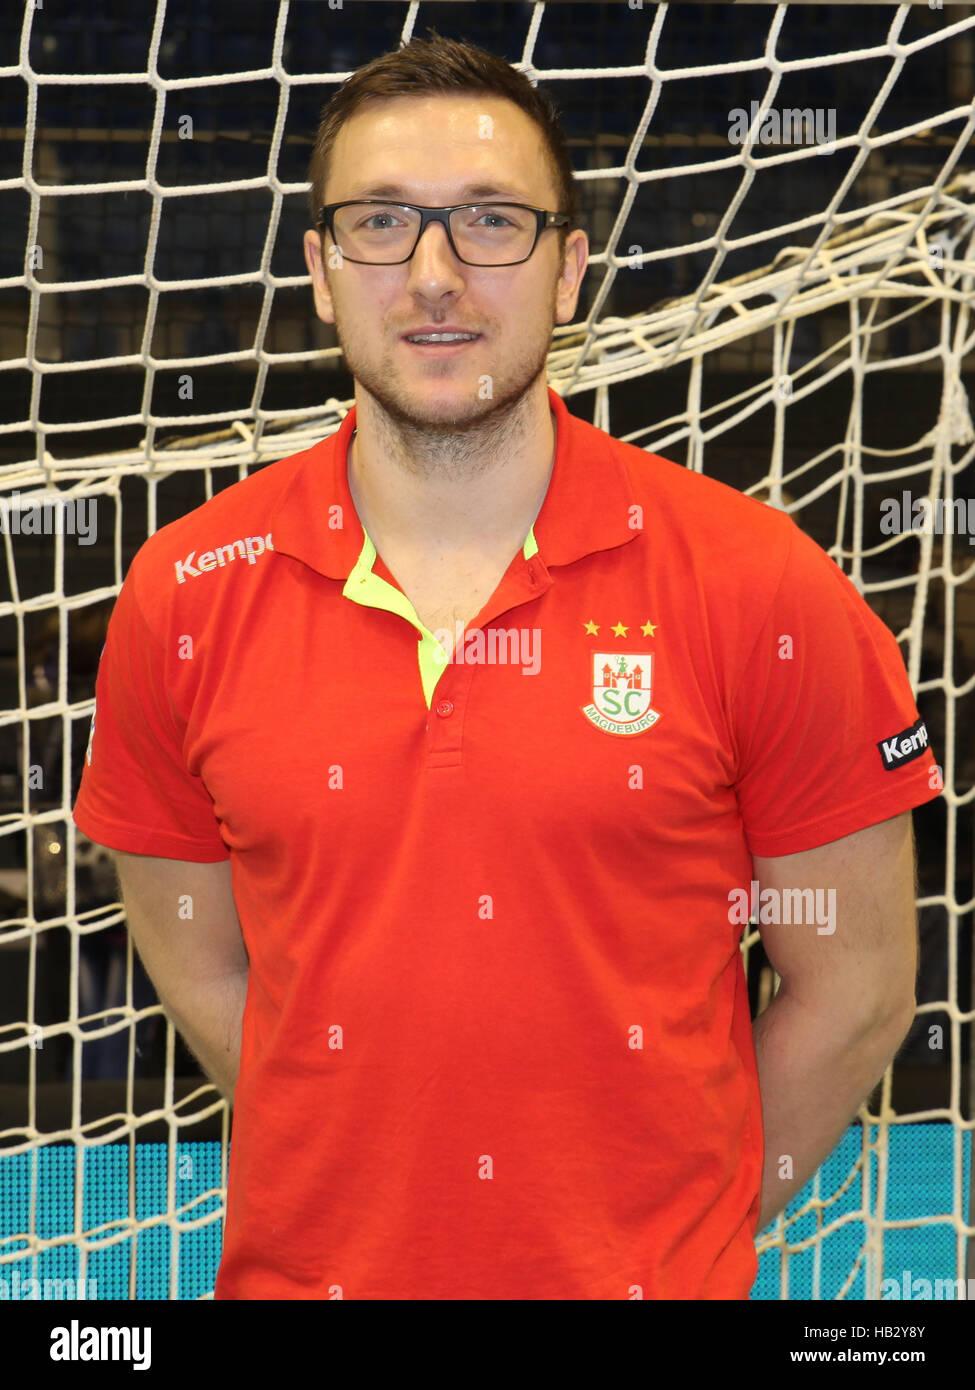 Andreas Rojewski (SC Magdeburg) - Stock Image